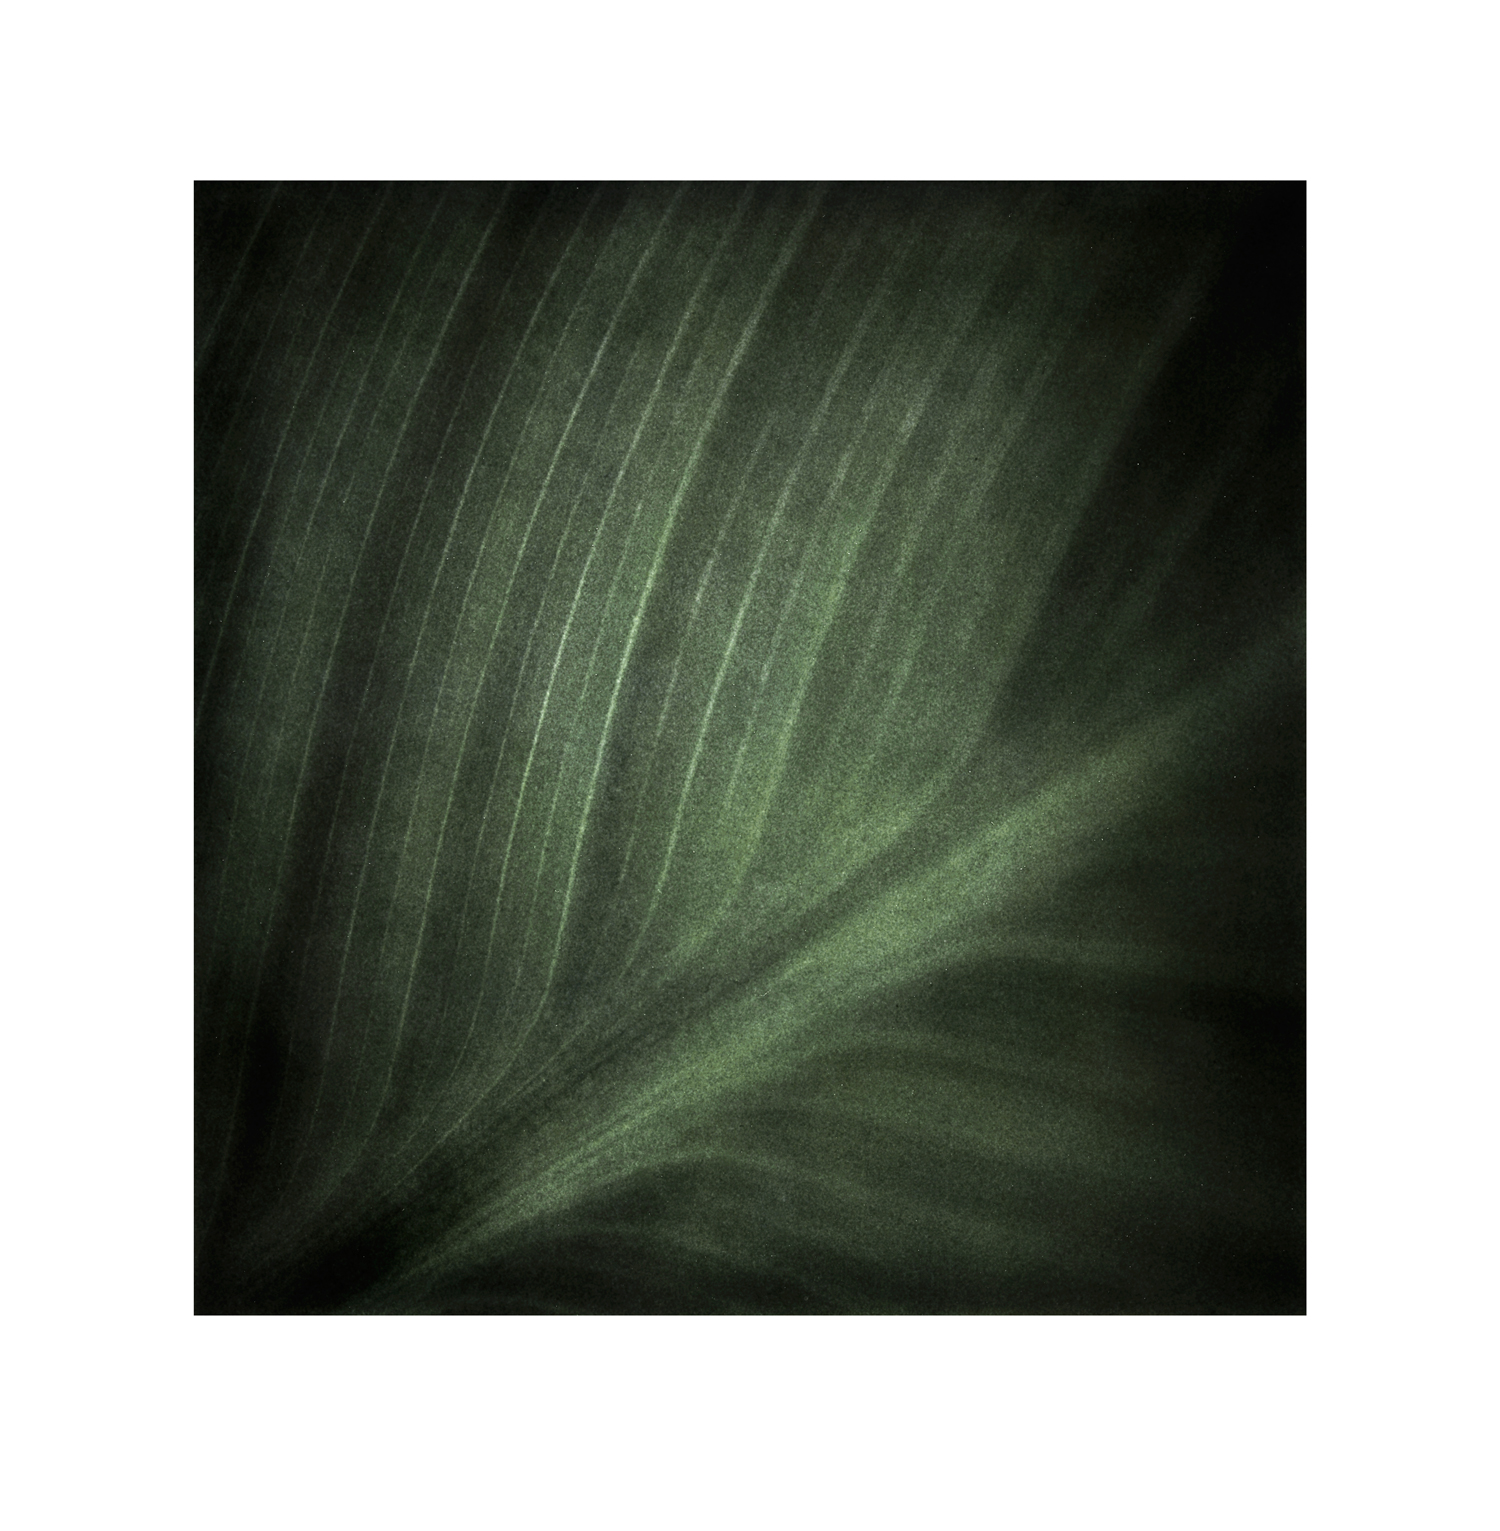 Garden-of-Secrets-No.15.jpg